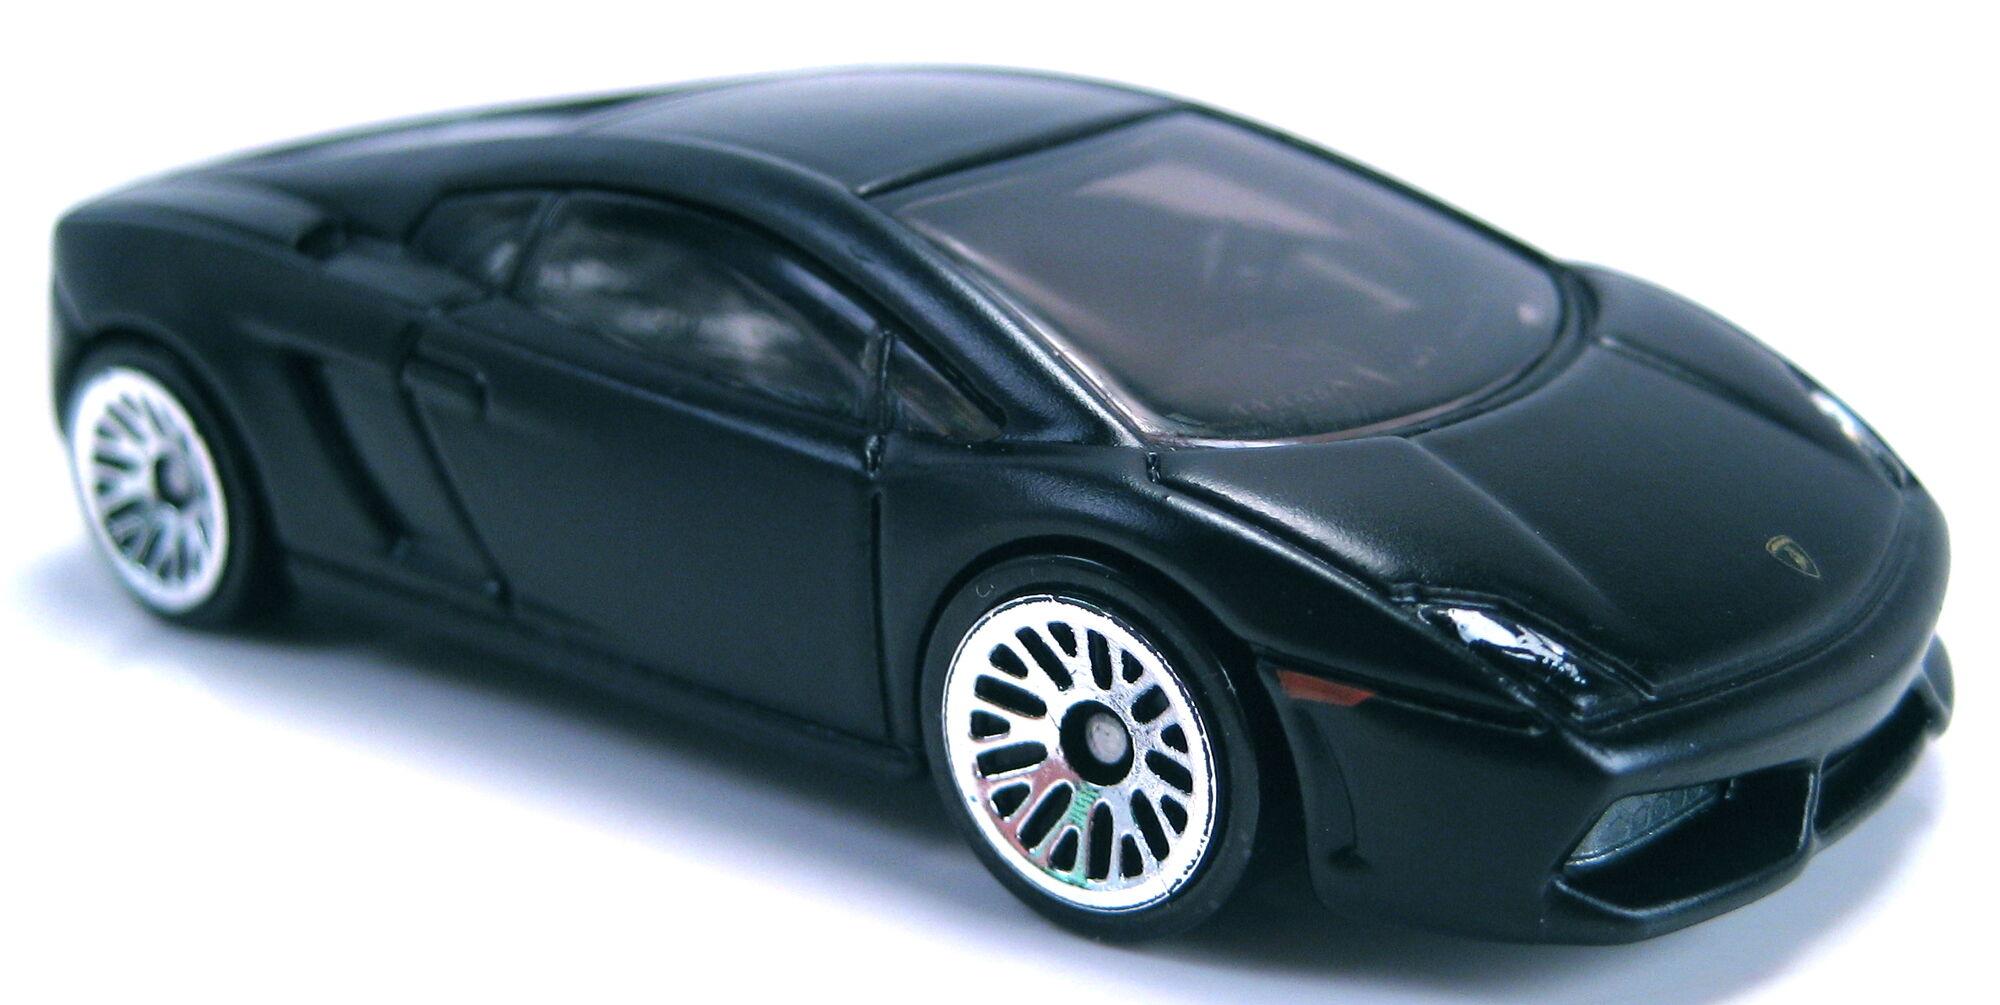 2000?cb=20121023193116 Surprising Lamborghini Gallardo Hot Wheels Wiki Cars Trend